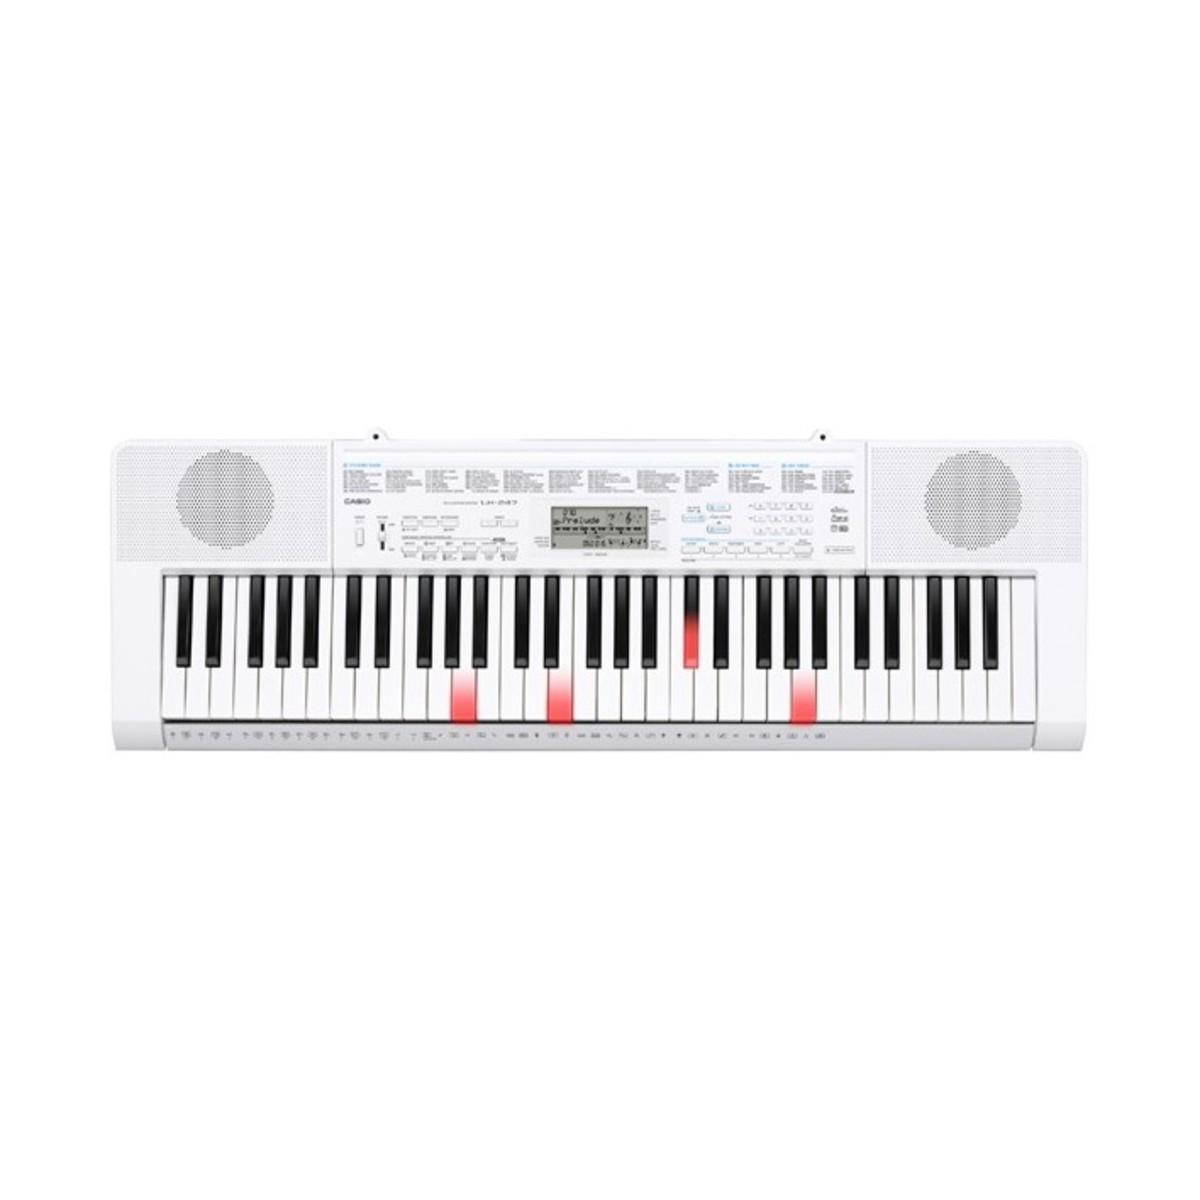 best loved 9c8a8 9e3a9 DISC Casio LK-247 Key Lighting Keyboard